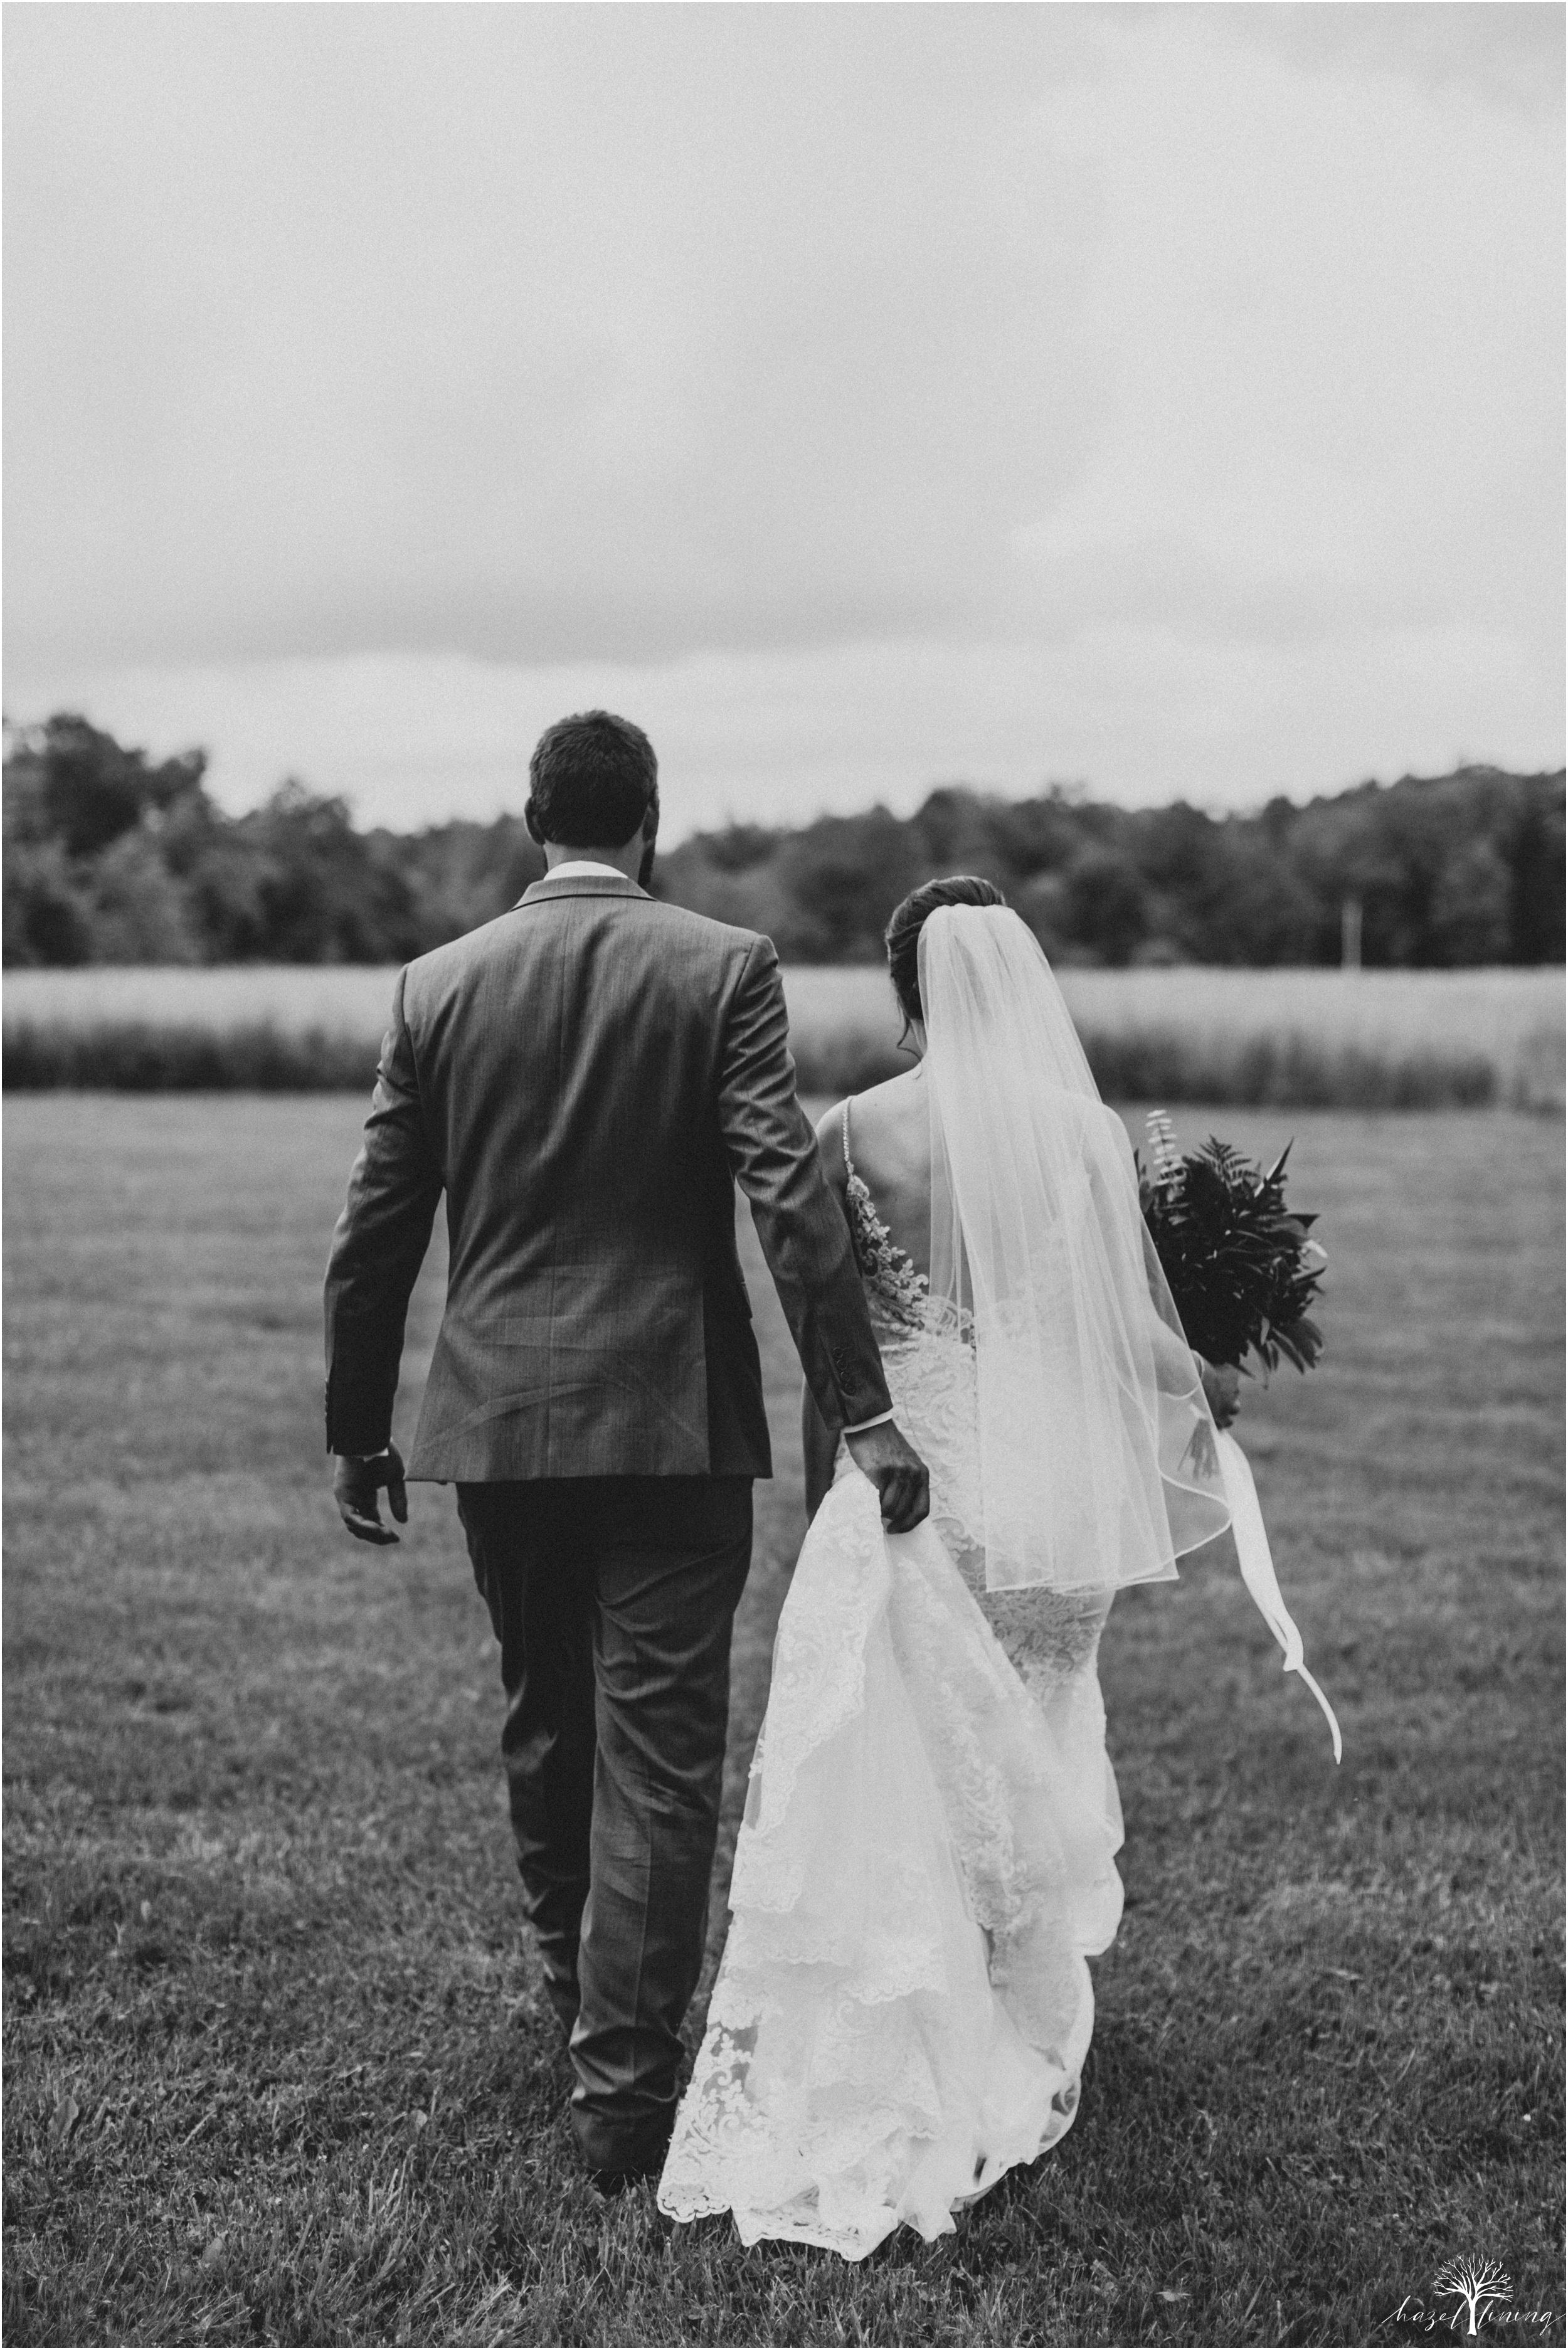 hazel-lining-travel-wedding-elopement-photography-lisa-landon-shoemaker-the-farm-bakery-and-events-bucks-county-quakertown-pennsylvania-summer-country-outdoor-farm-wedding_0082.jpg